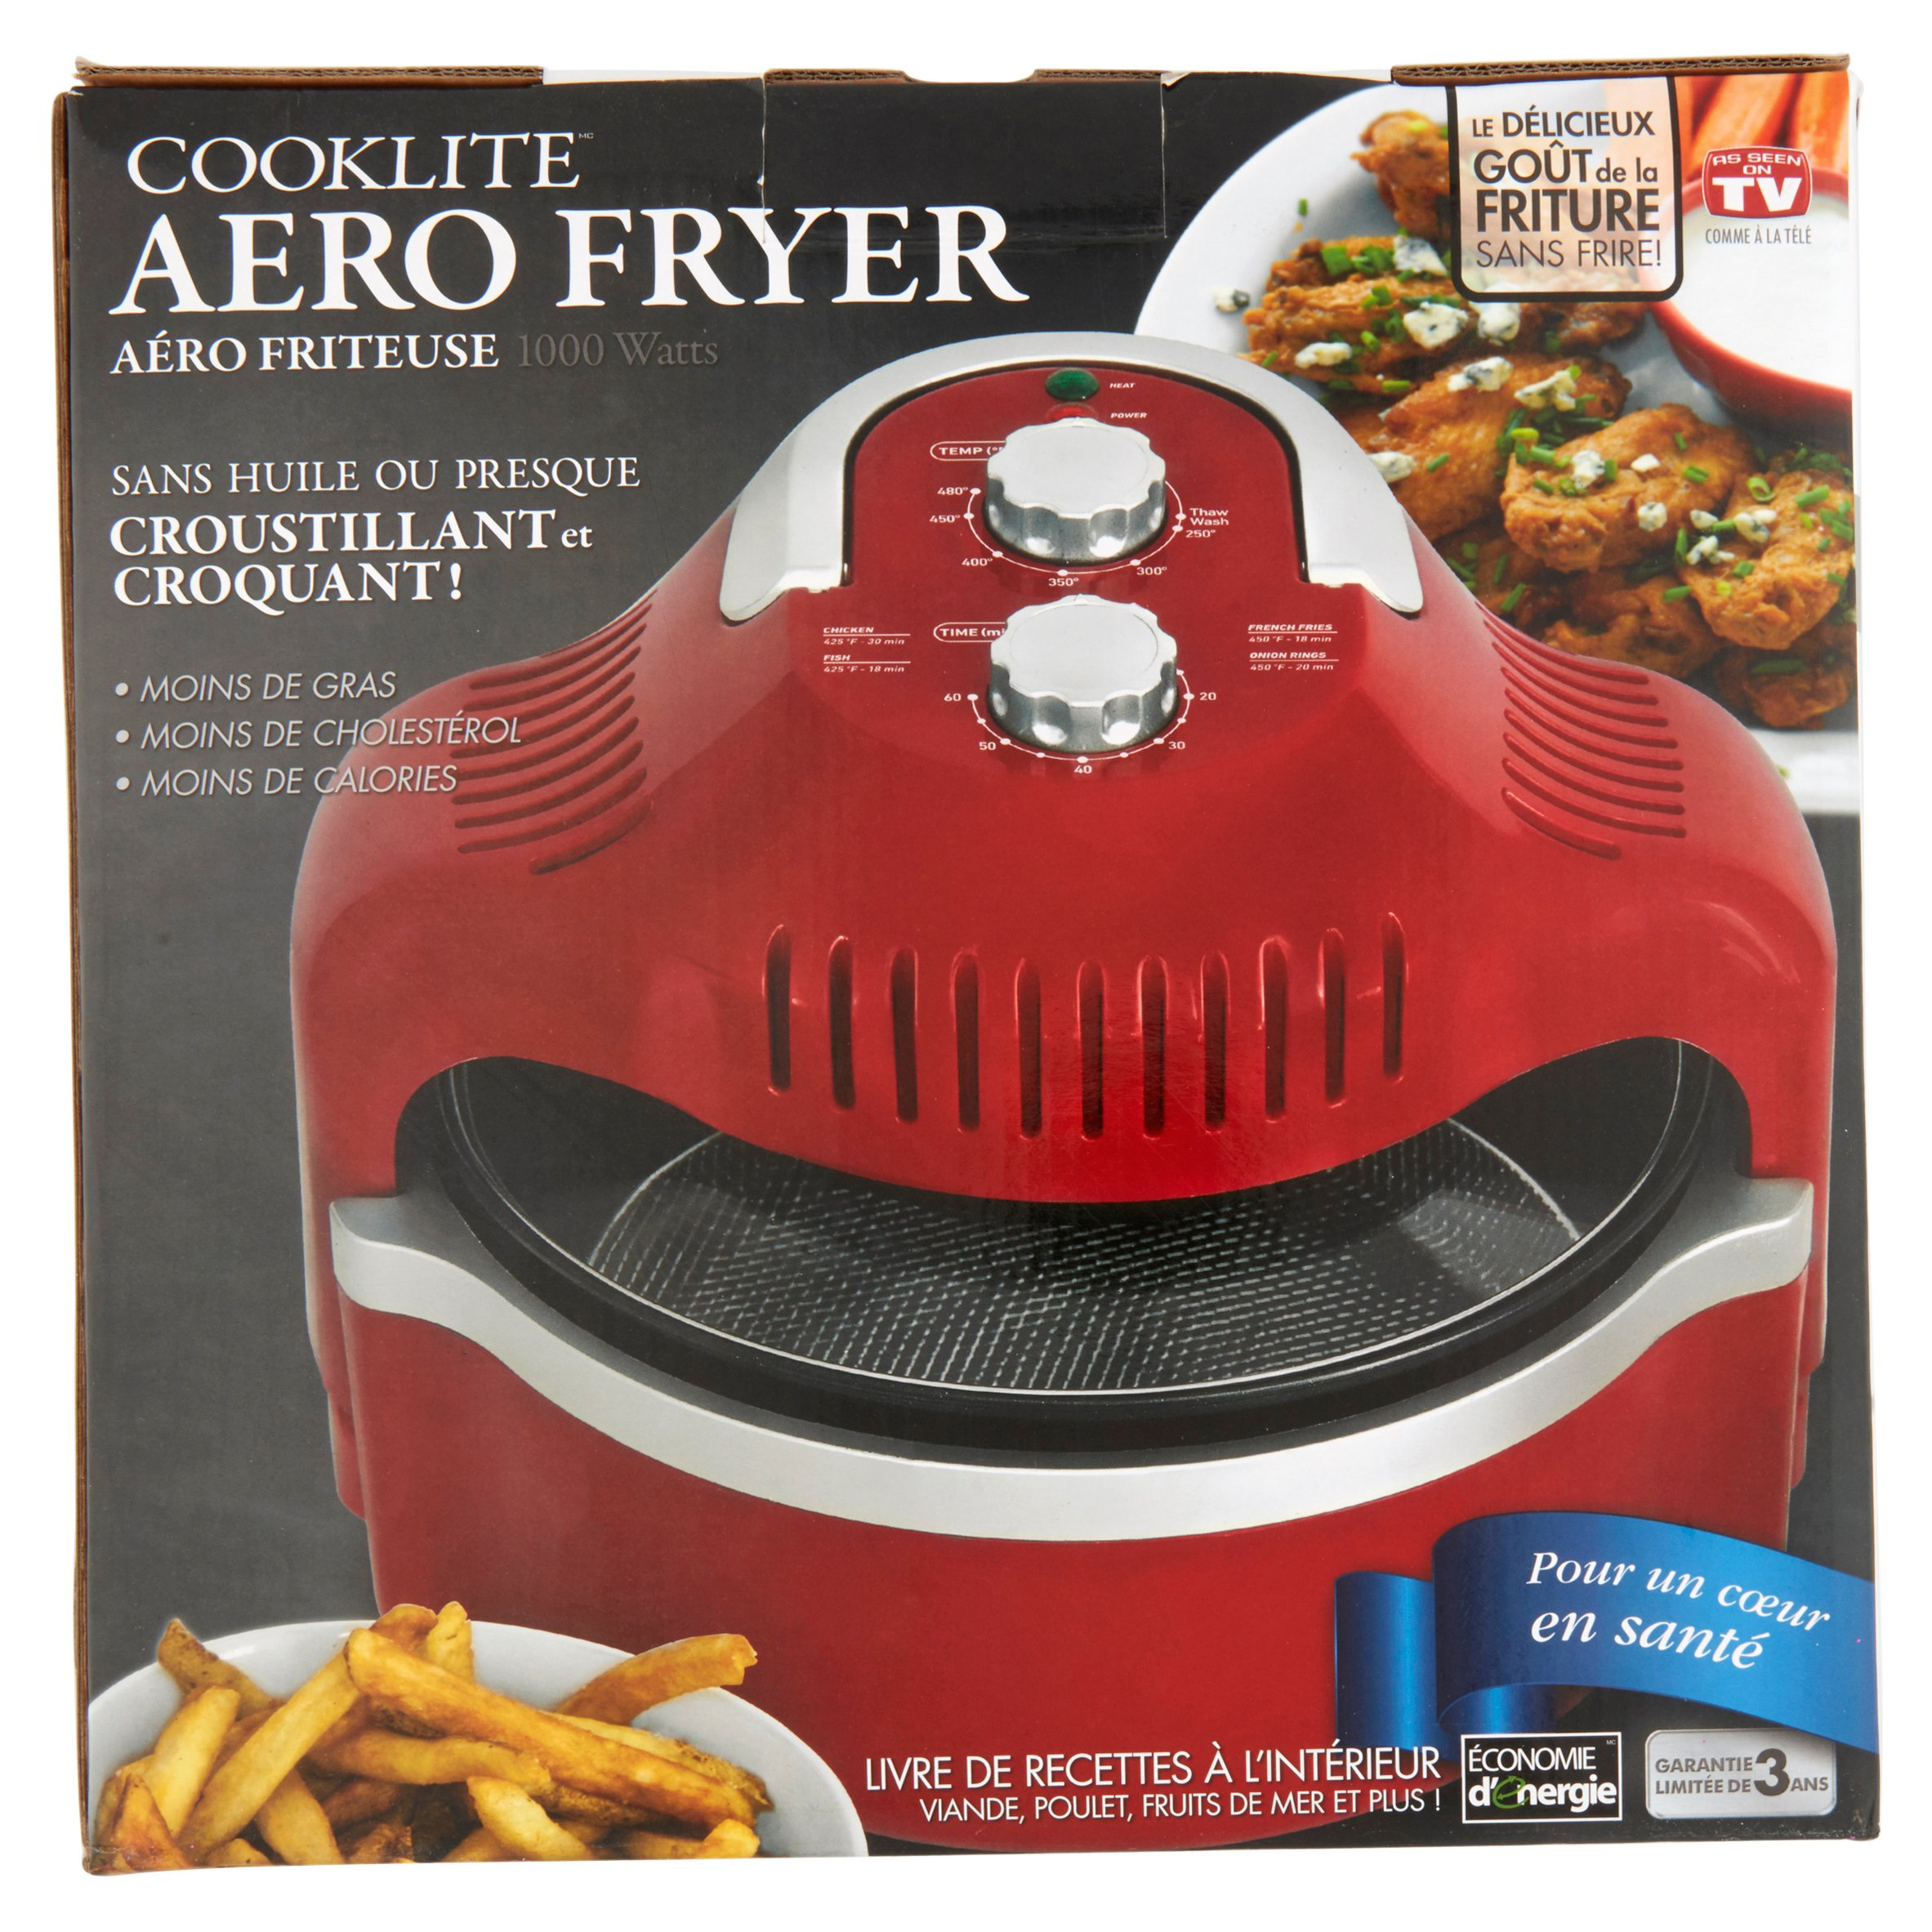 Cooklite 1000 Watts Aero Fryer